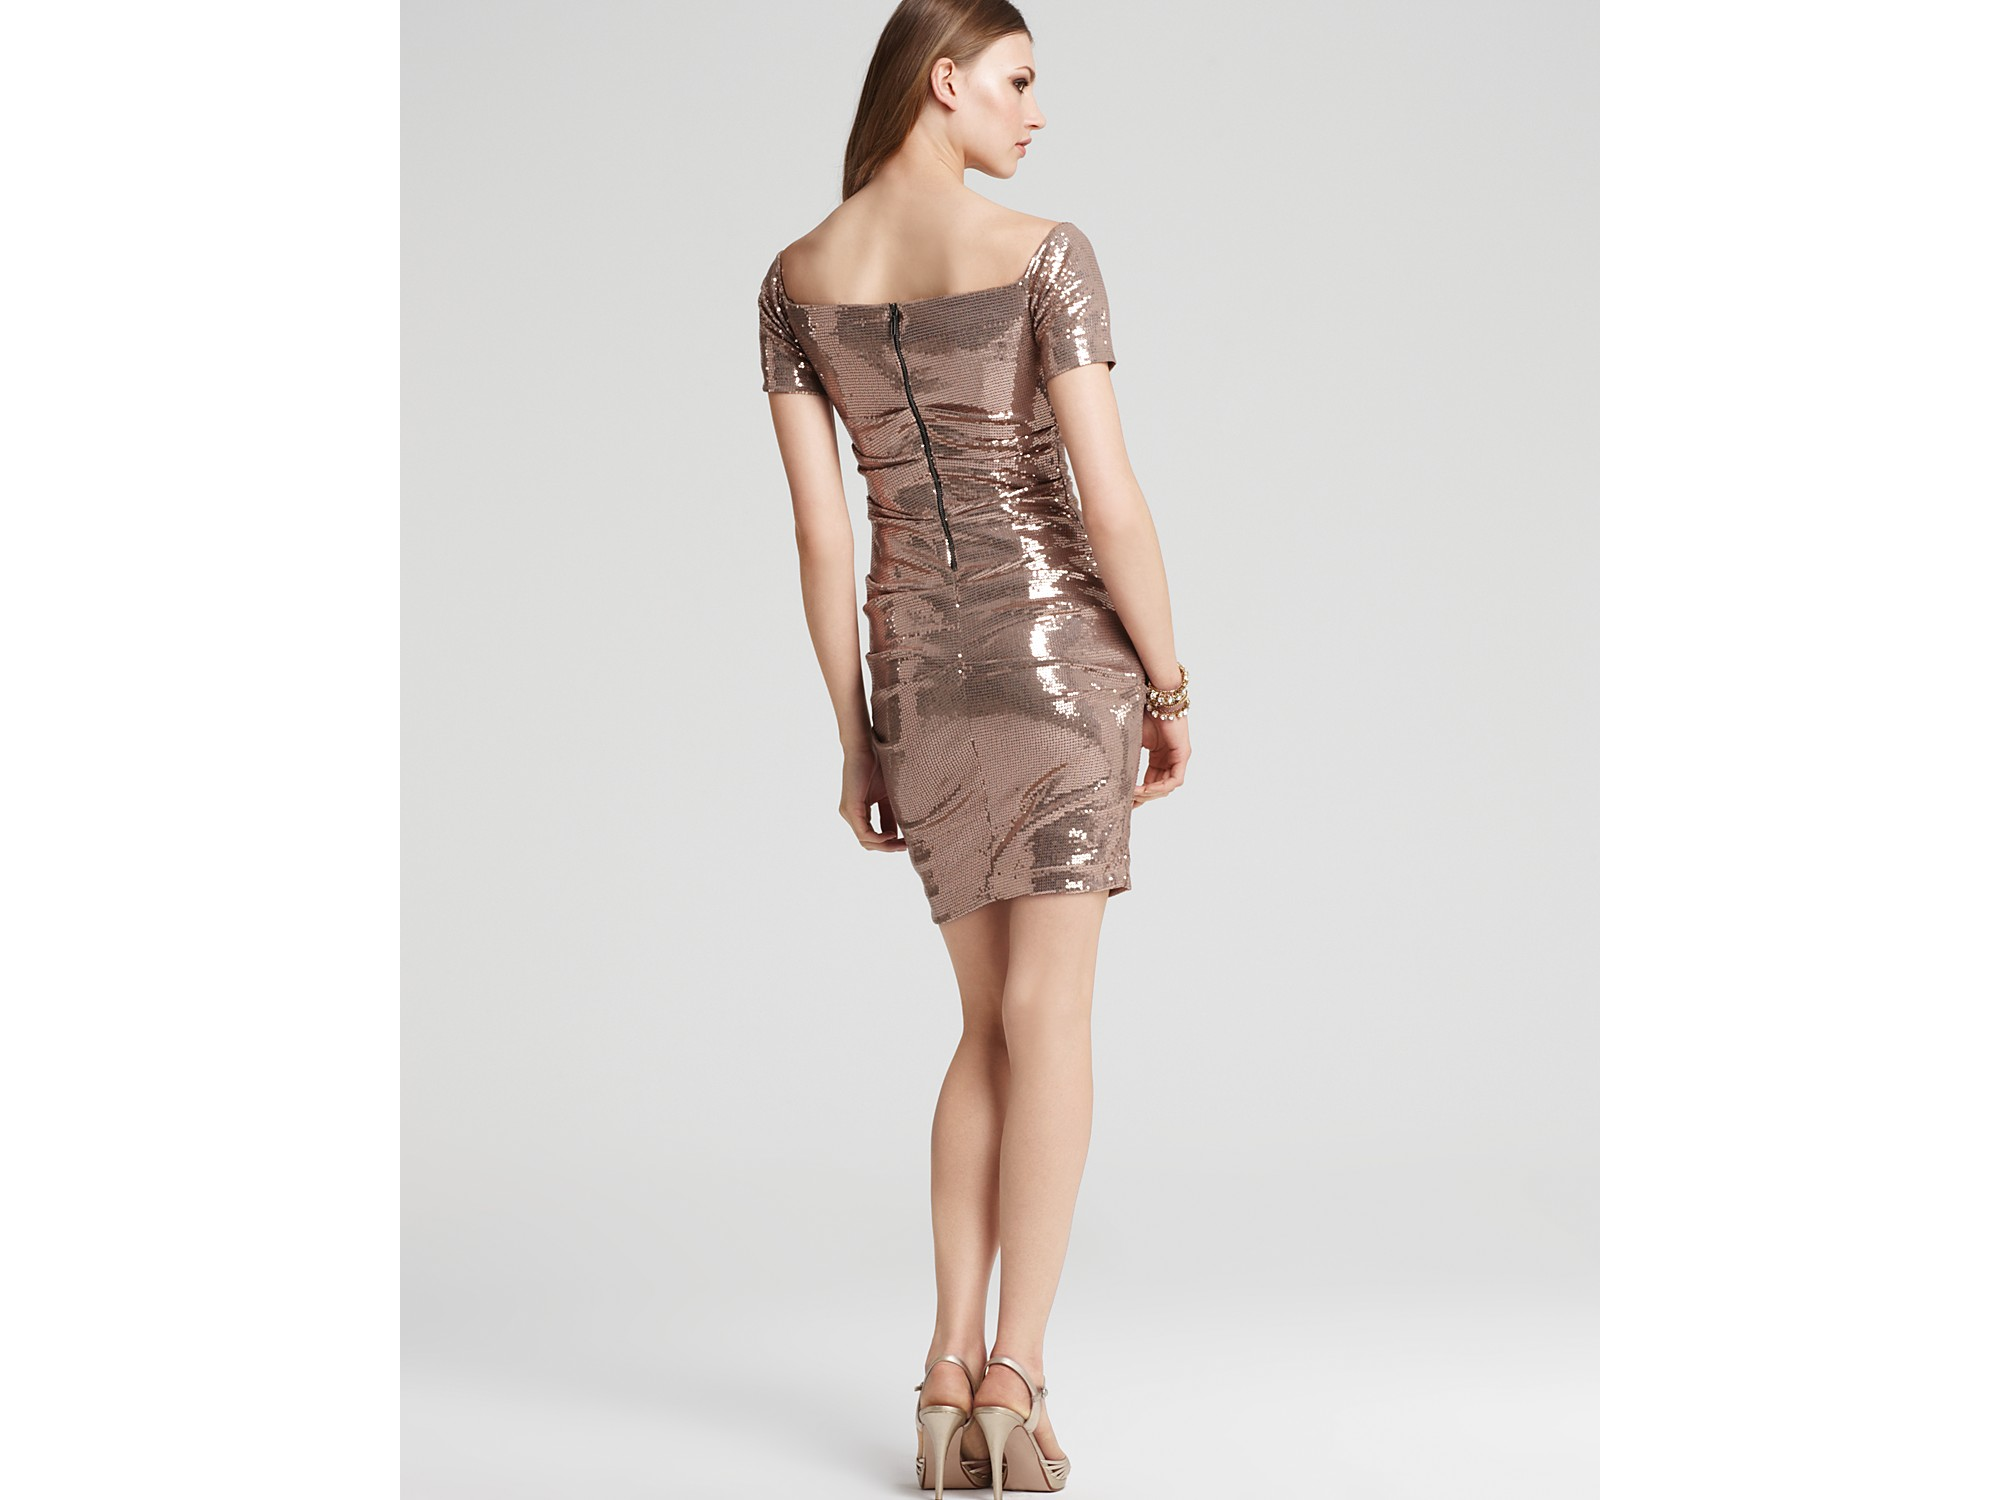 Nicole miller Off-shoulder Stretch Sequin Dress in Pink - Lyst